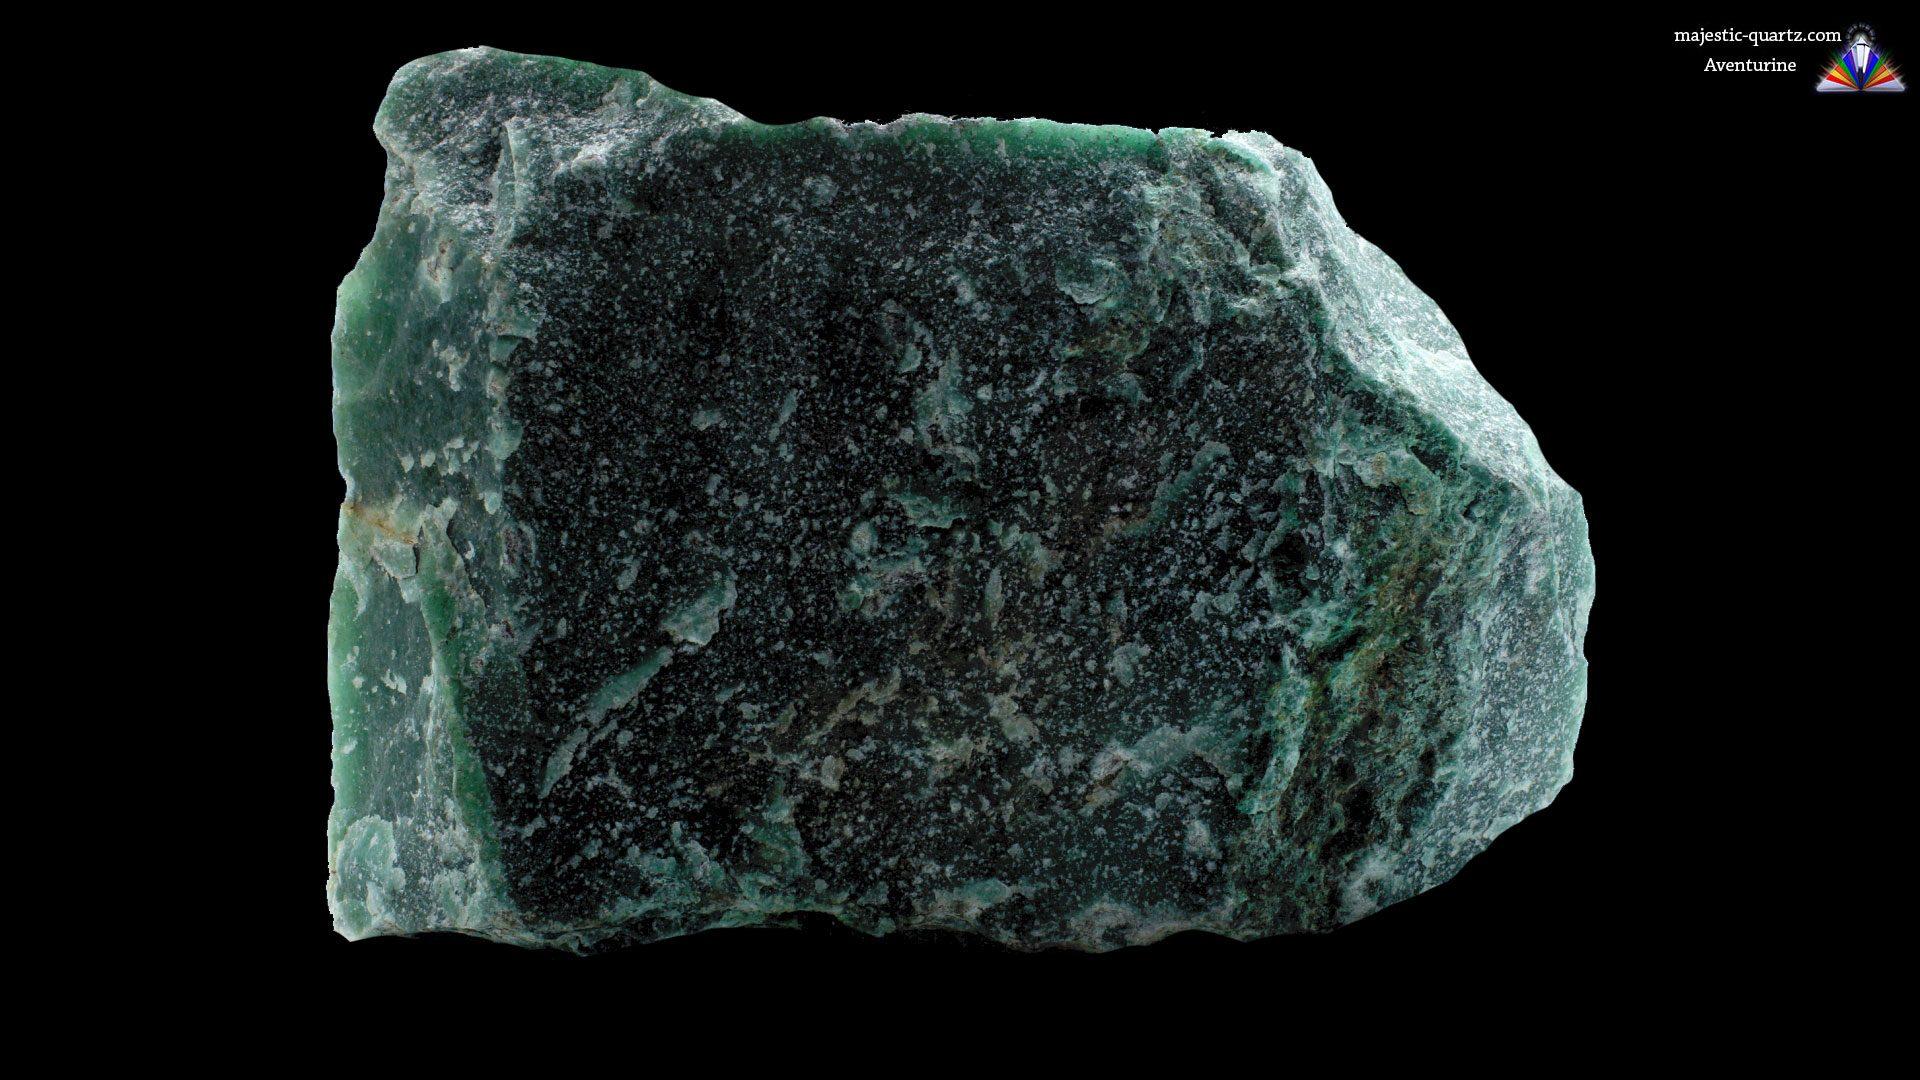 Aventurine Crystal Specimen - Mineral Specimen